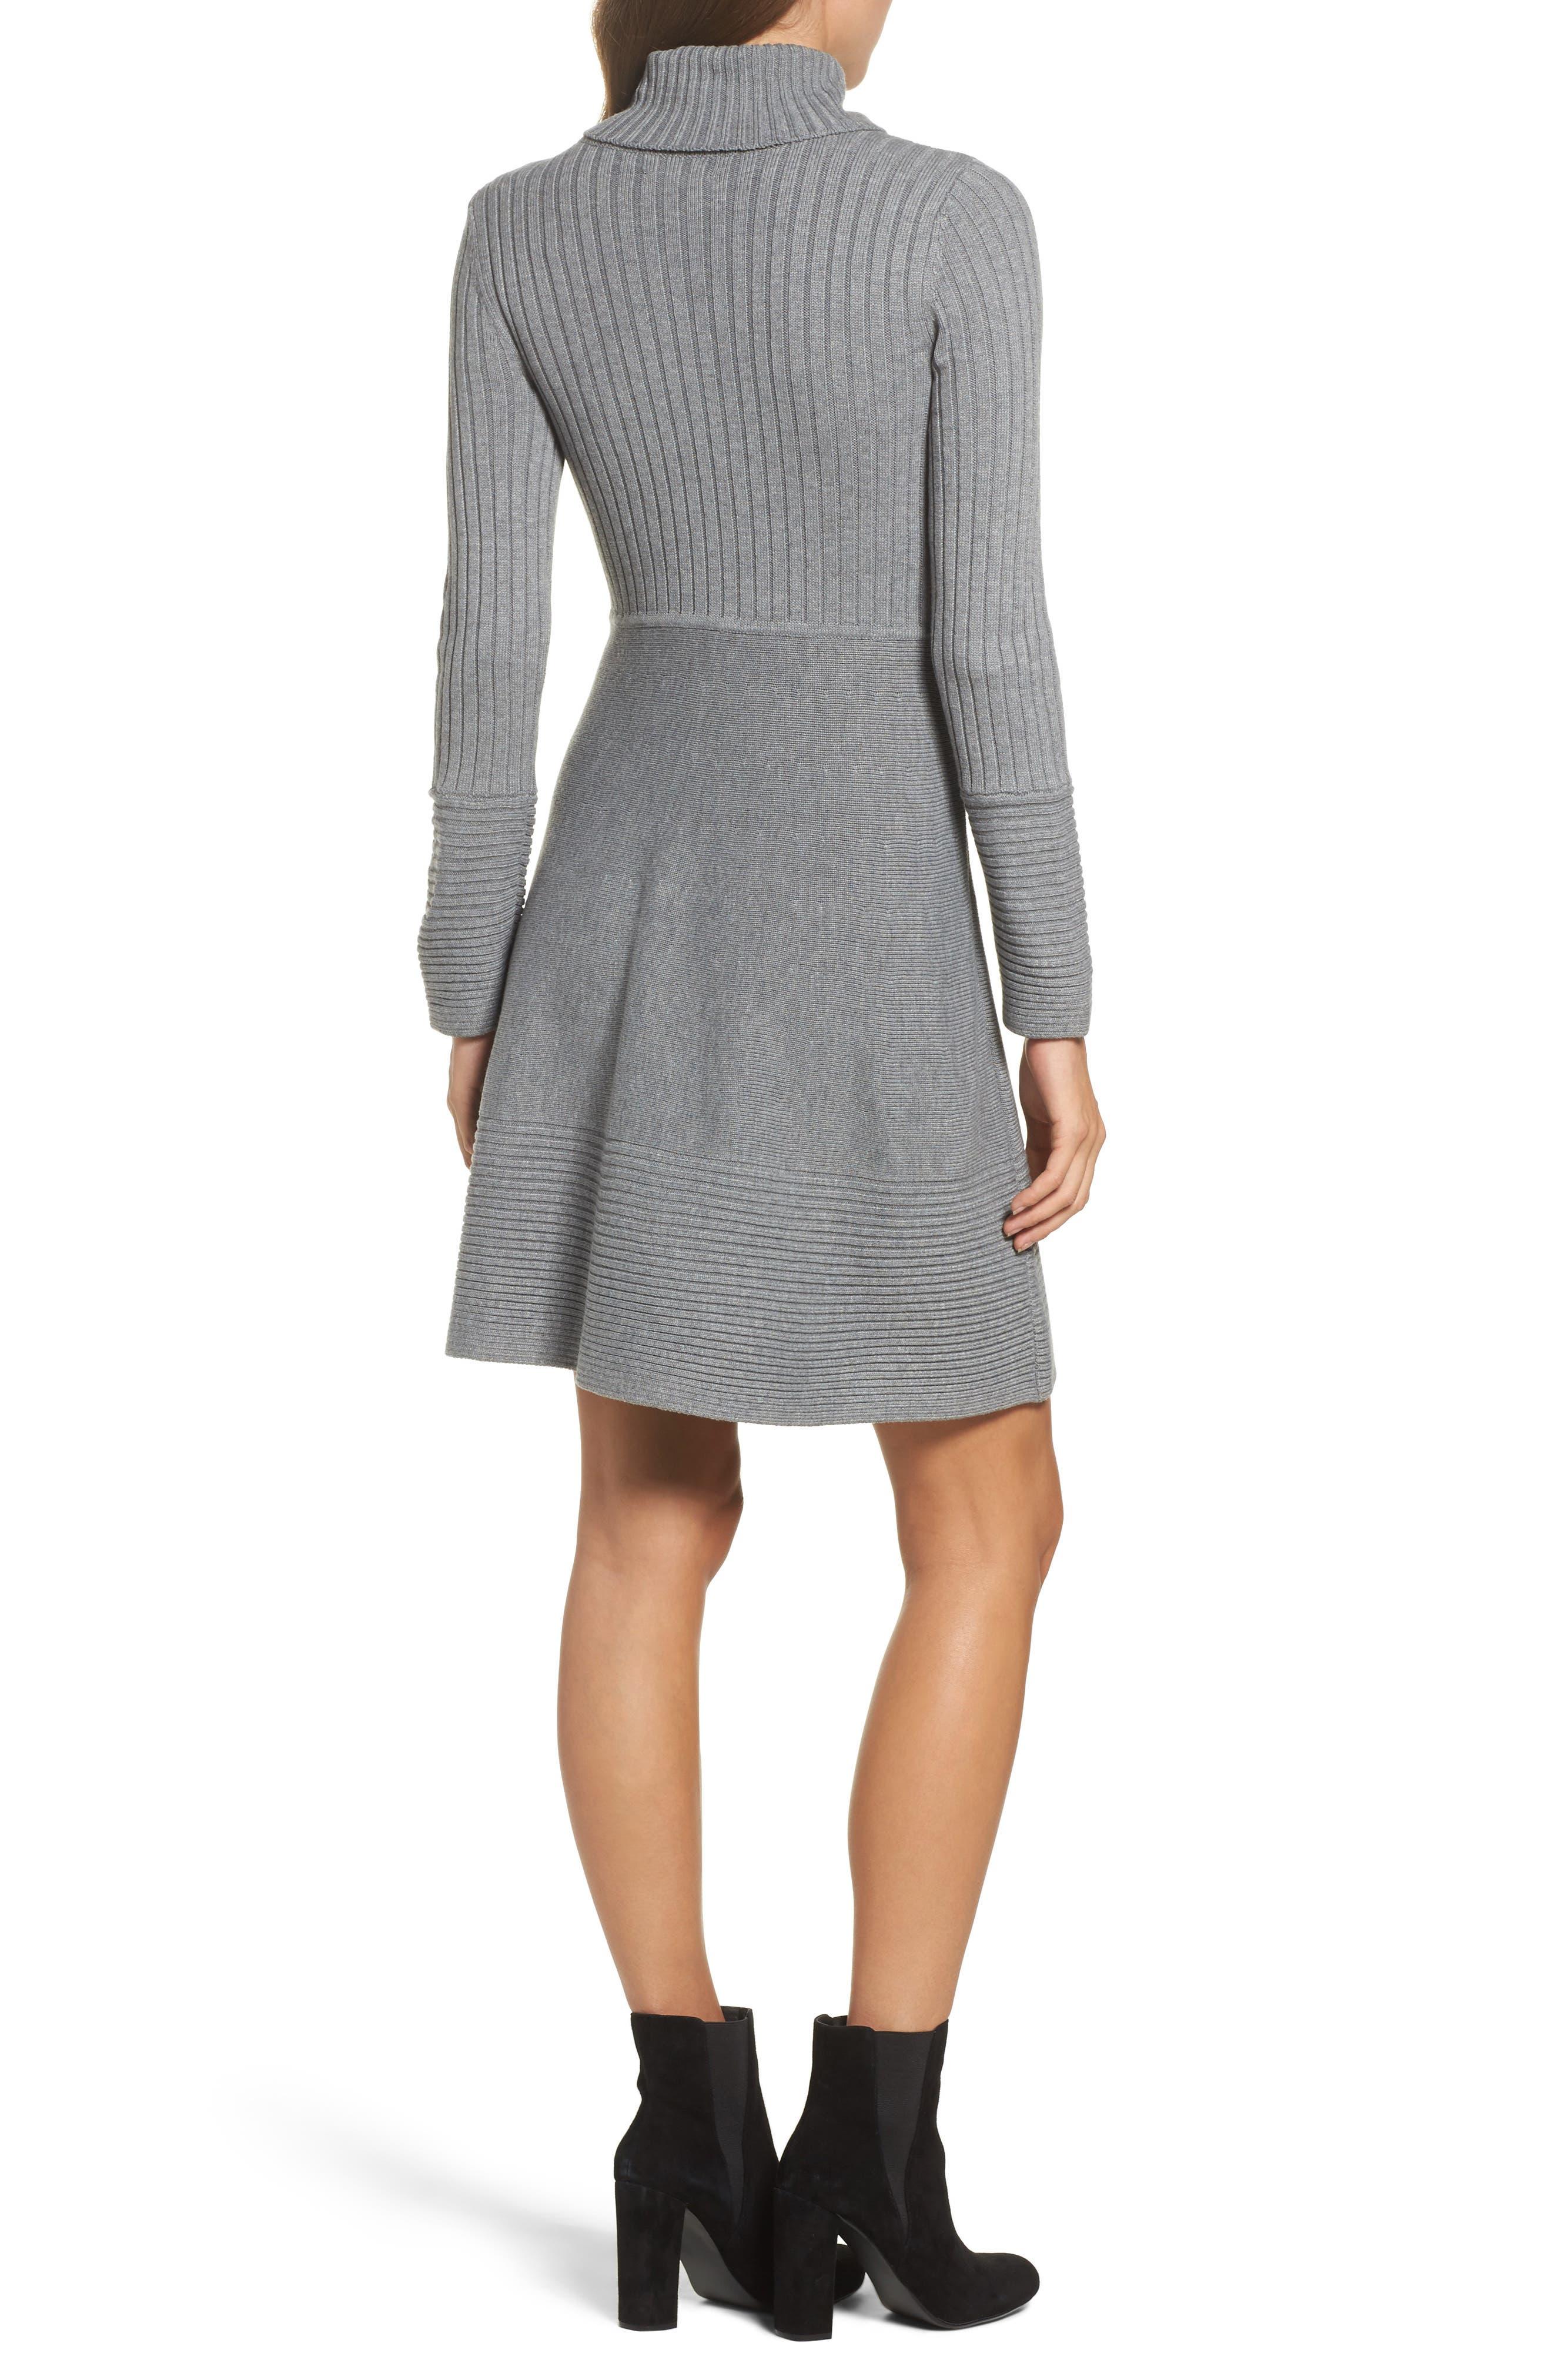 ELIZA J, Turtleneck Sweater Dress, Alternate thumbnail 2, color, GREY